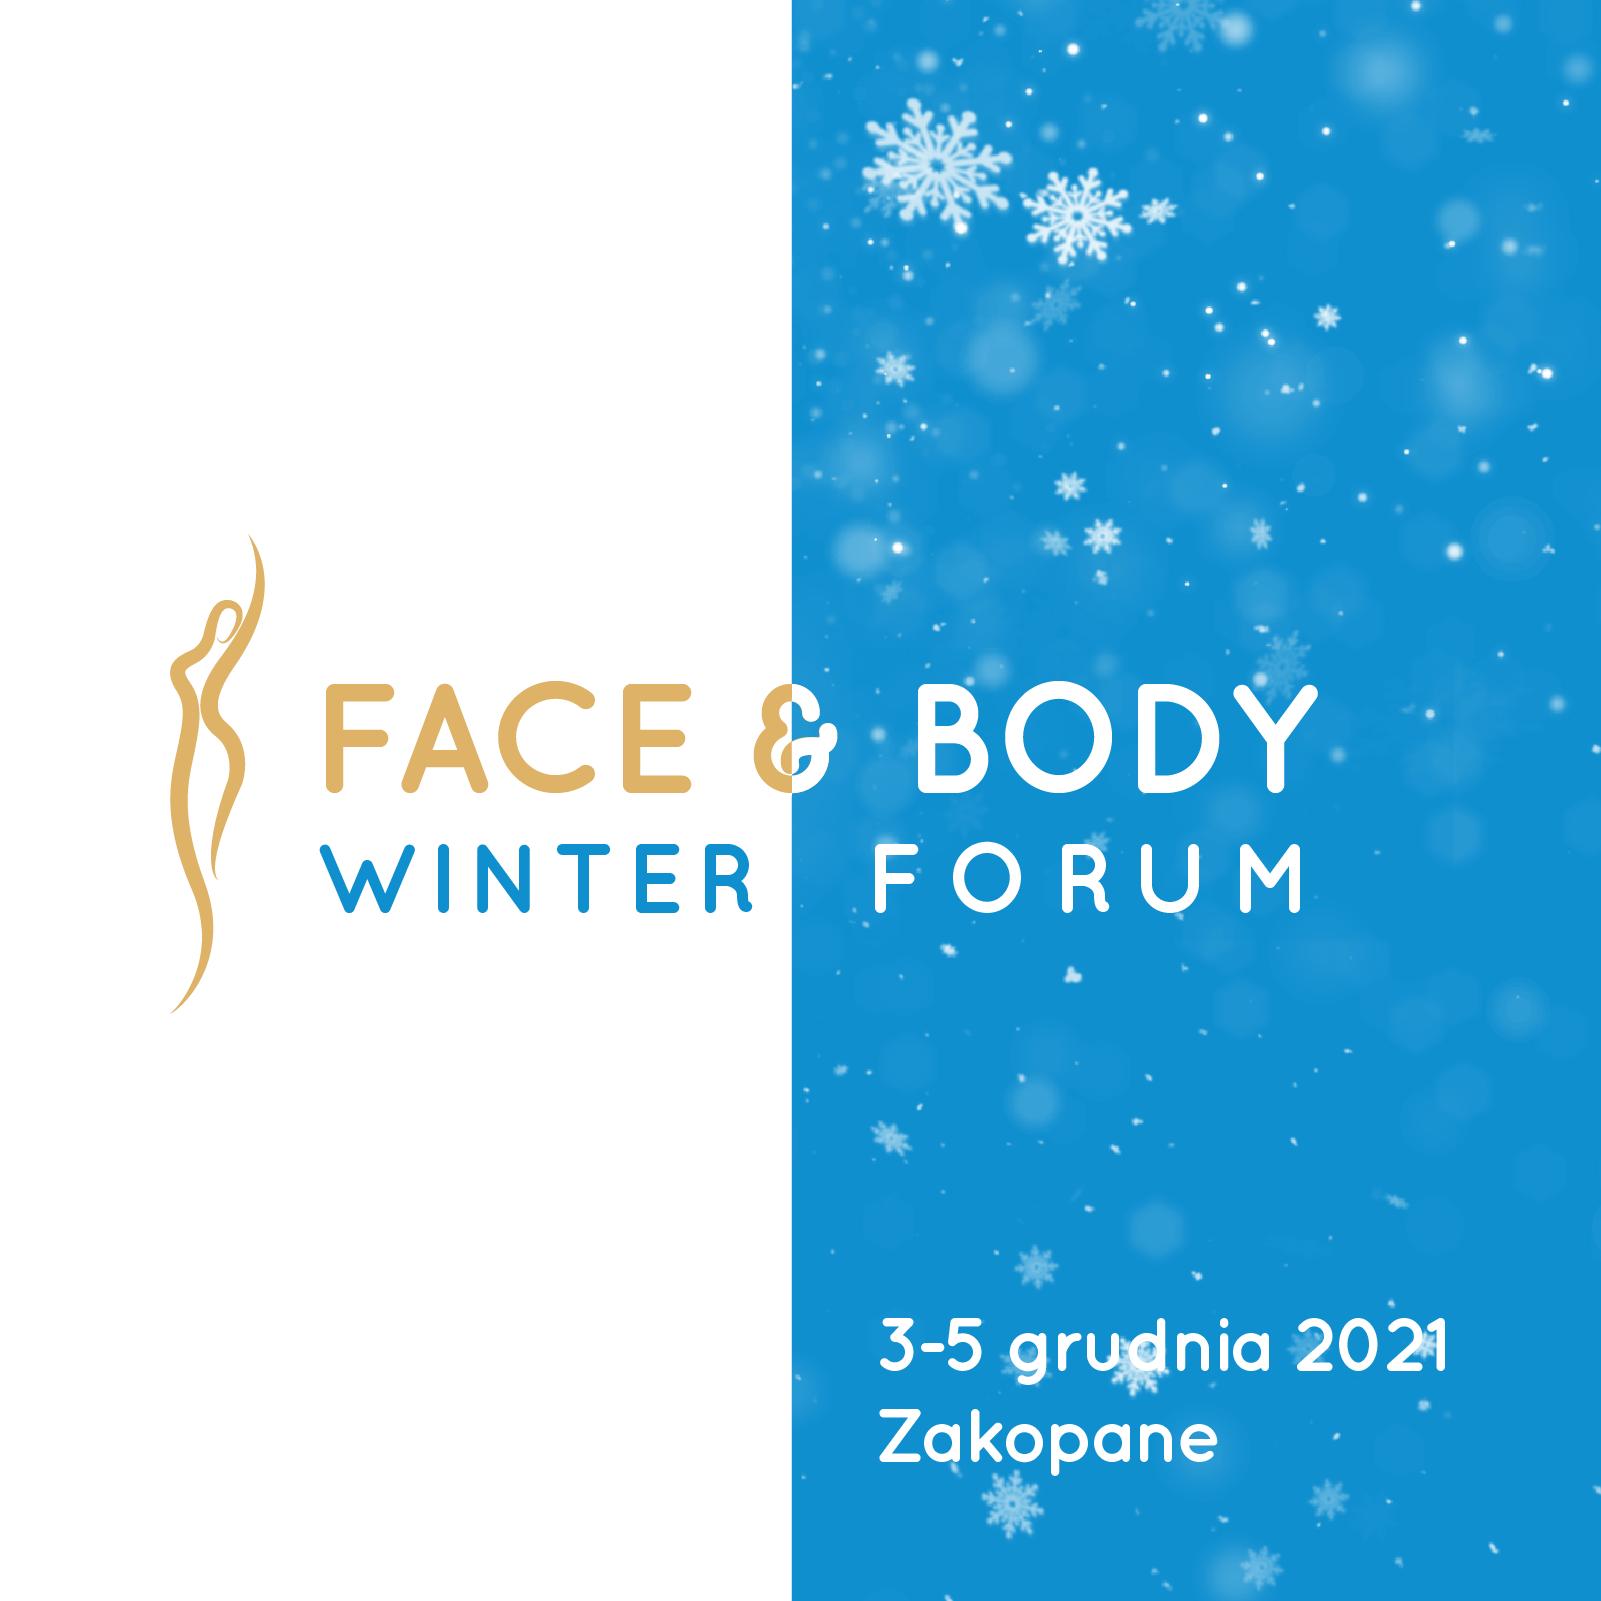 Face & Body Winter Forum   Zakopane, 3-5 grudnia 2021